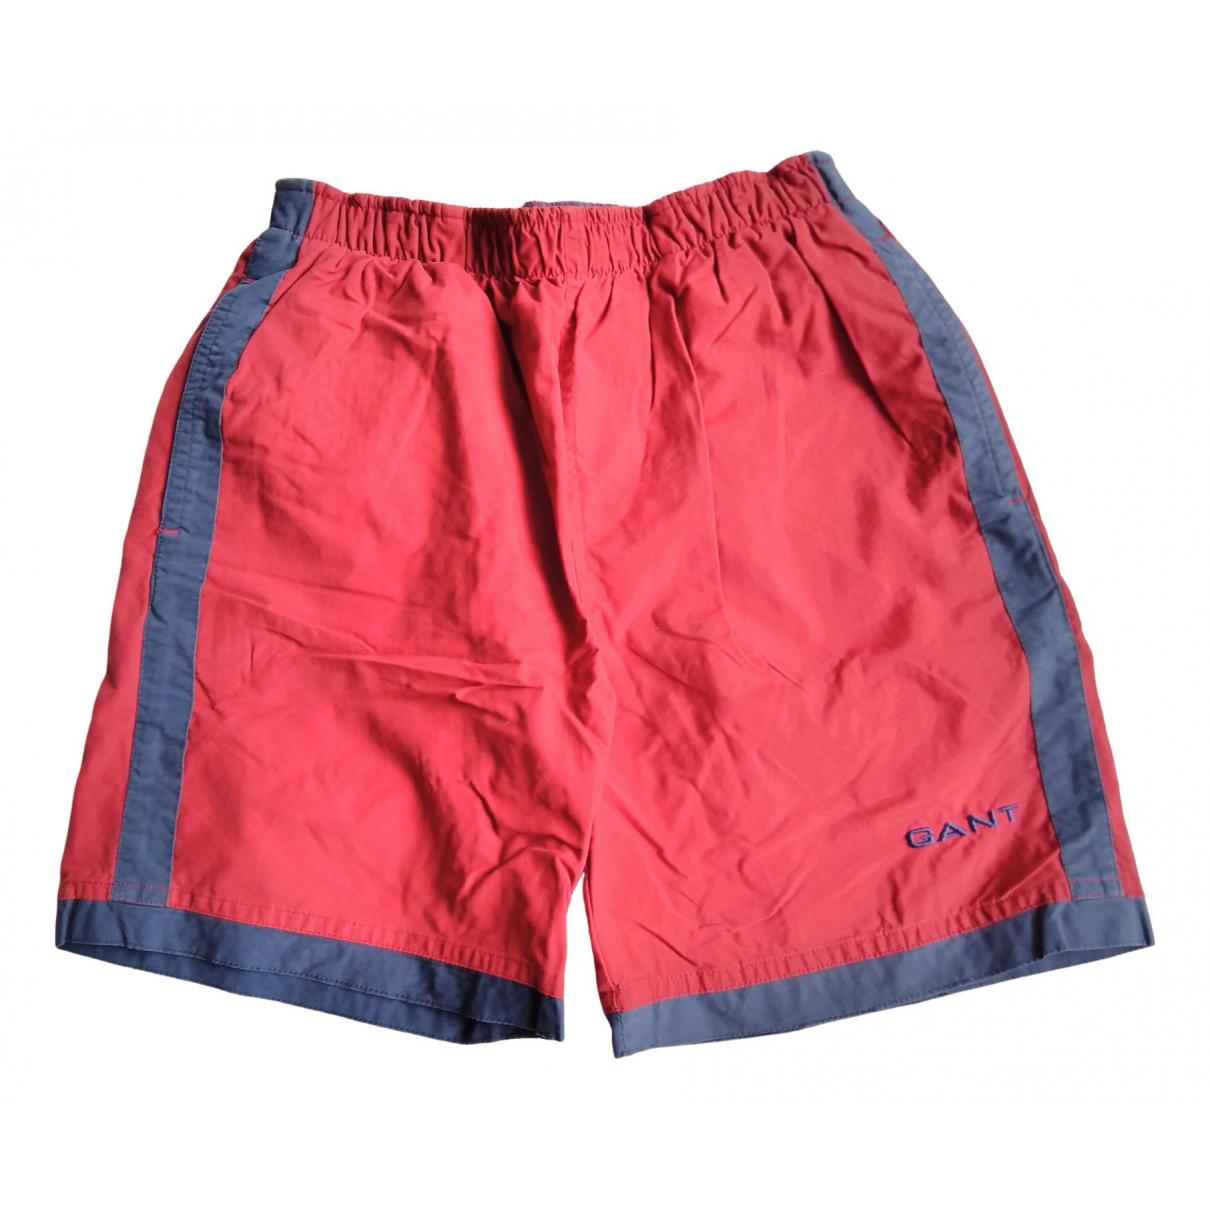 Pantalon corto Gant